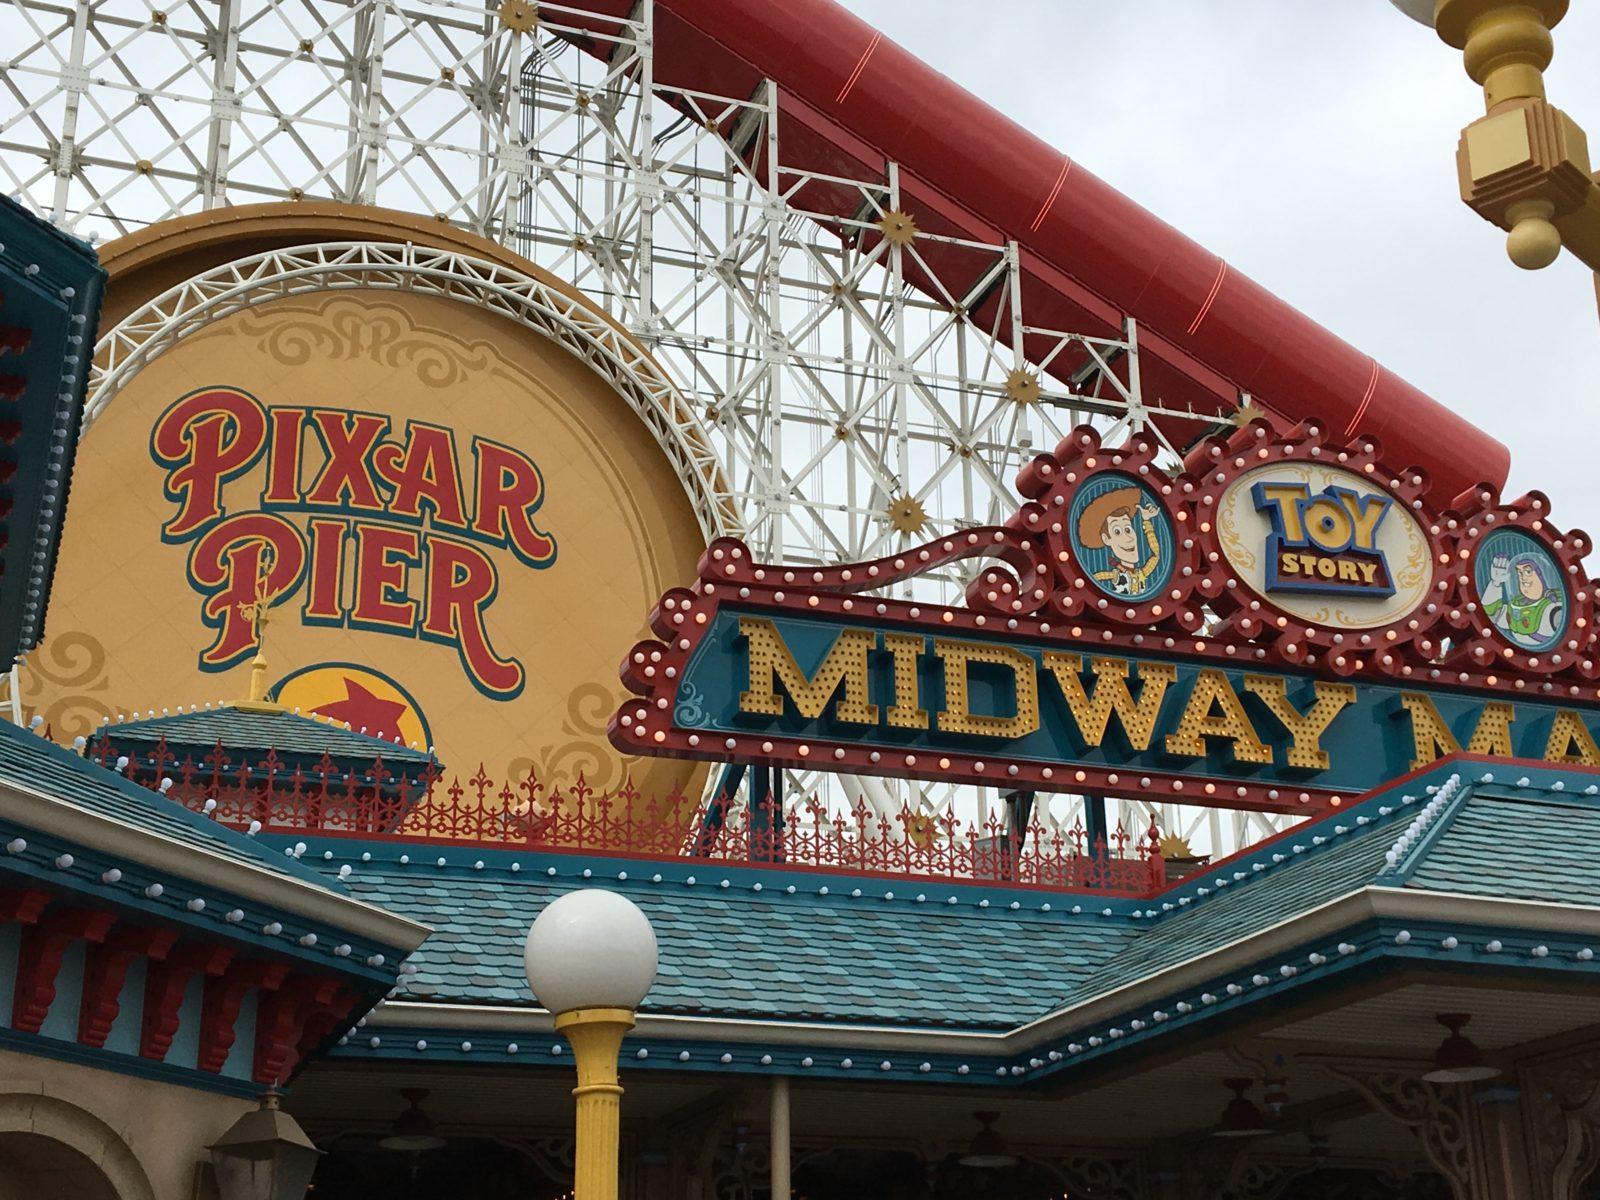 Disneyland - Pixar Pier